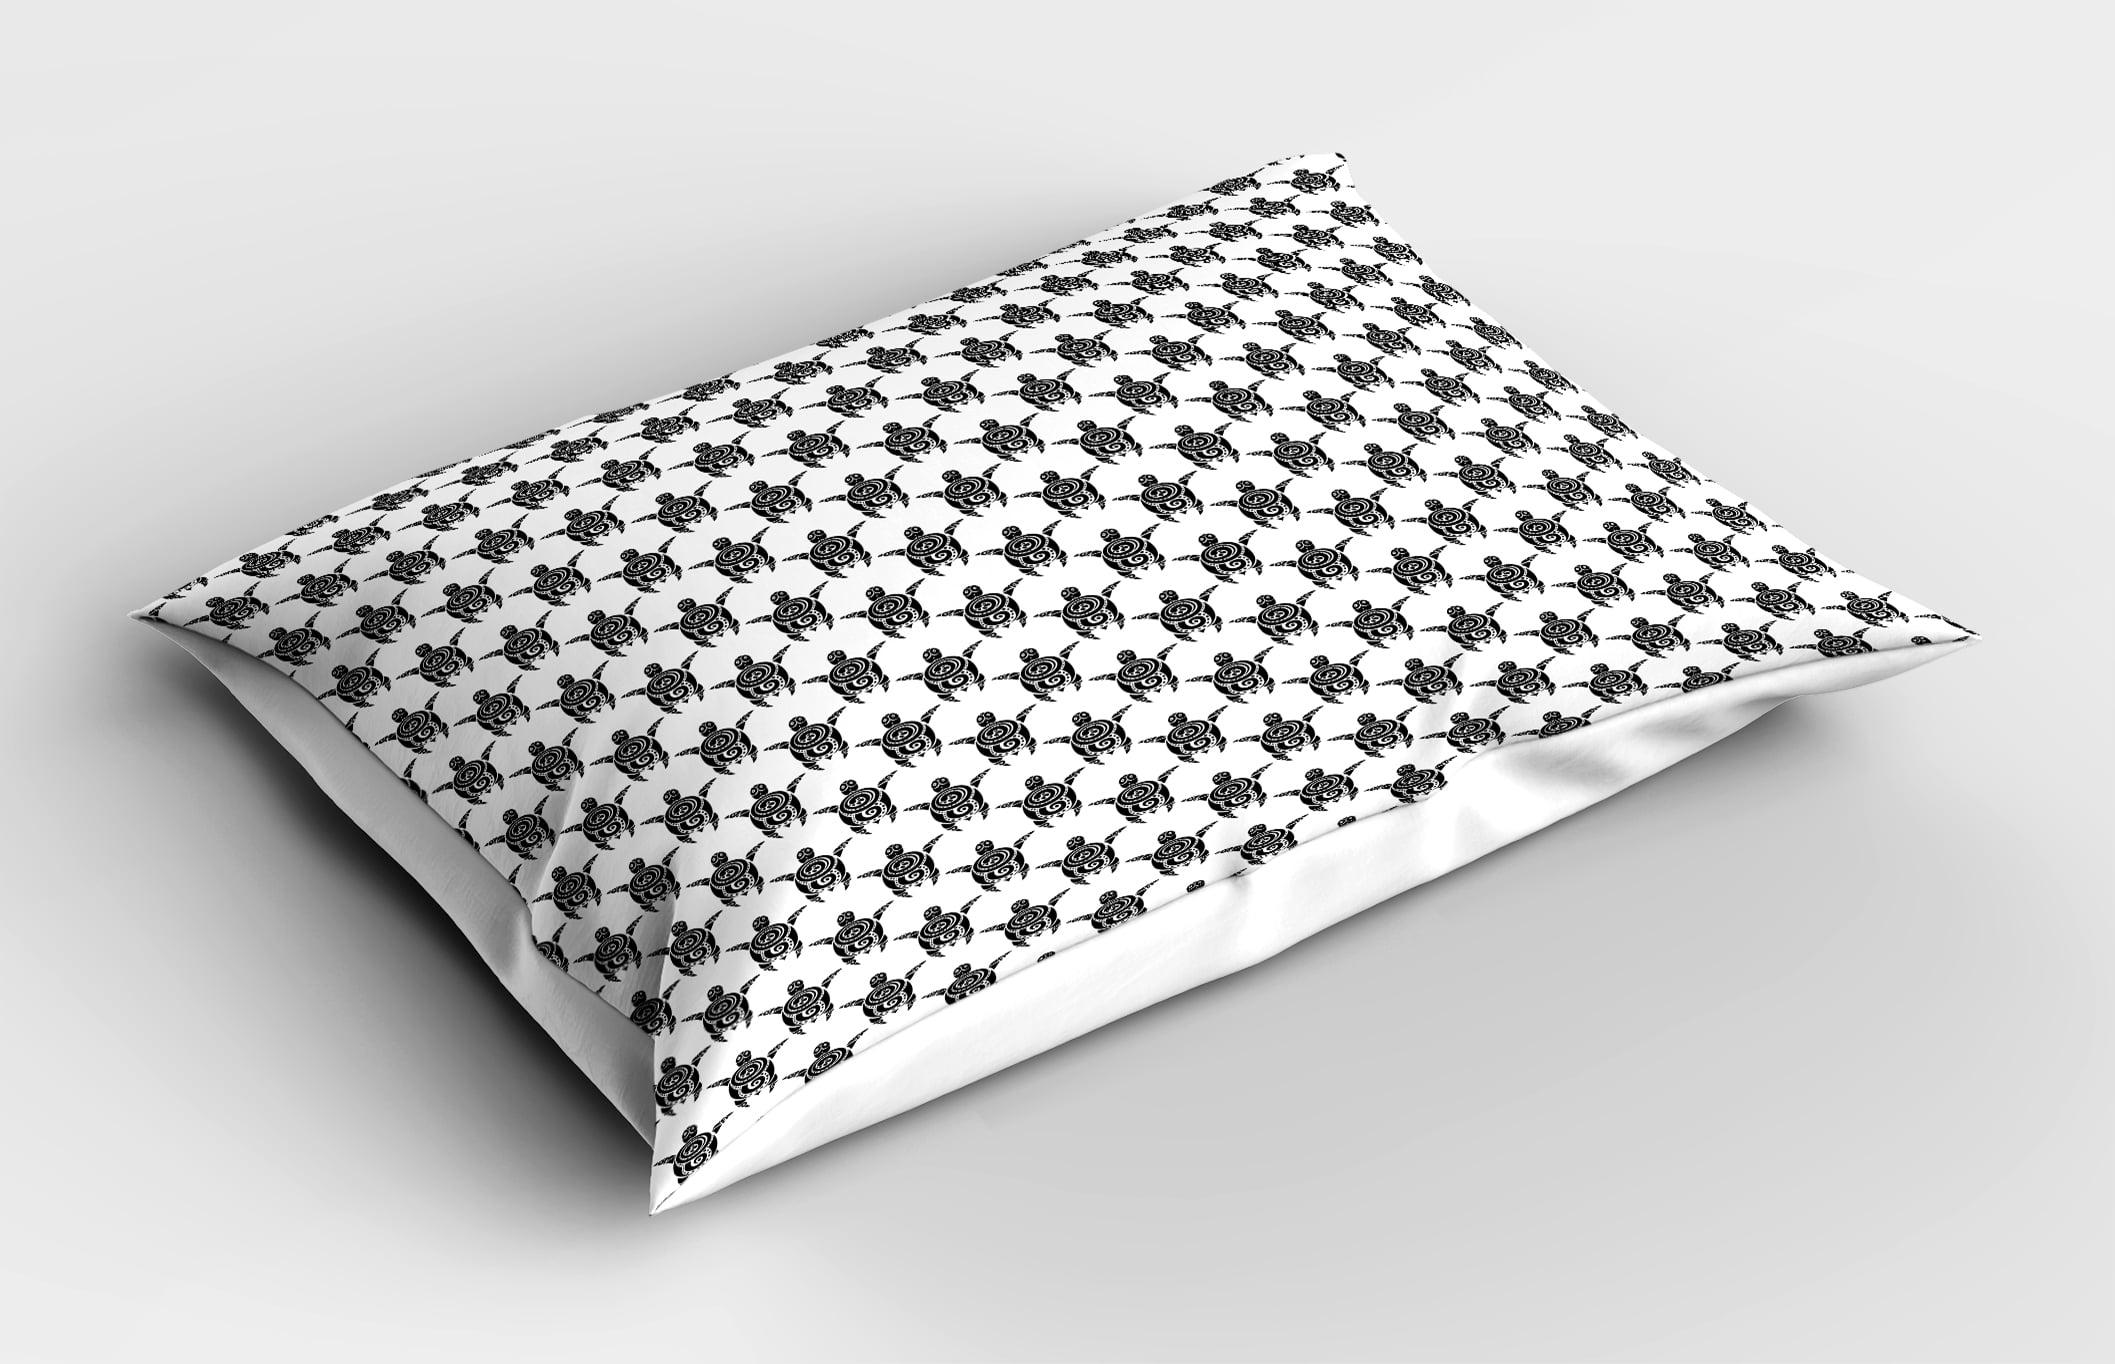 f7f45cc41f51d Tattoo Pillow Sham Pattern with Sea Turtles in Maori Style Ethnic  Polynesian Tribal Swirly Motifs, Decorative Standard Size Printed Pillowcase,  ...